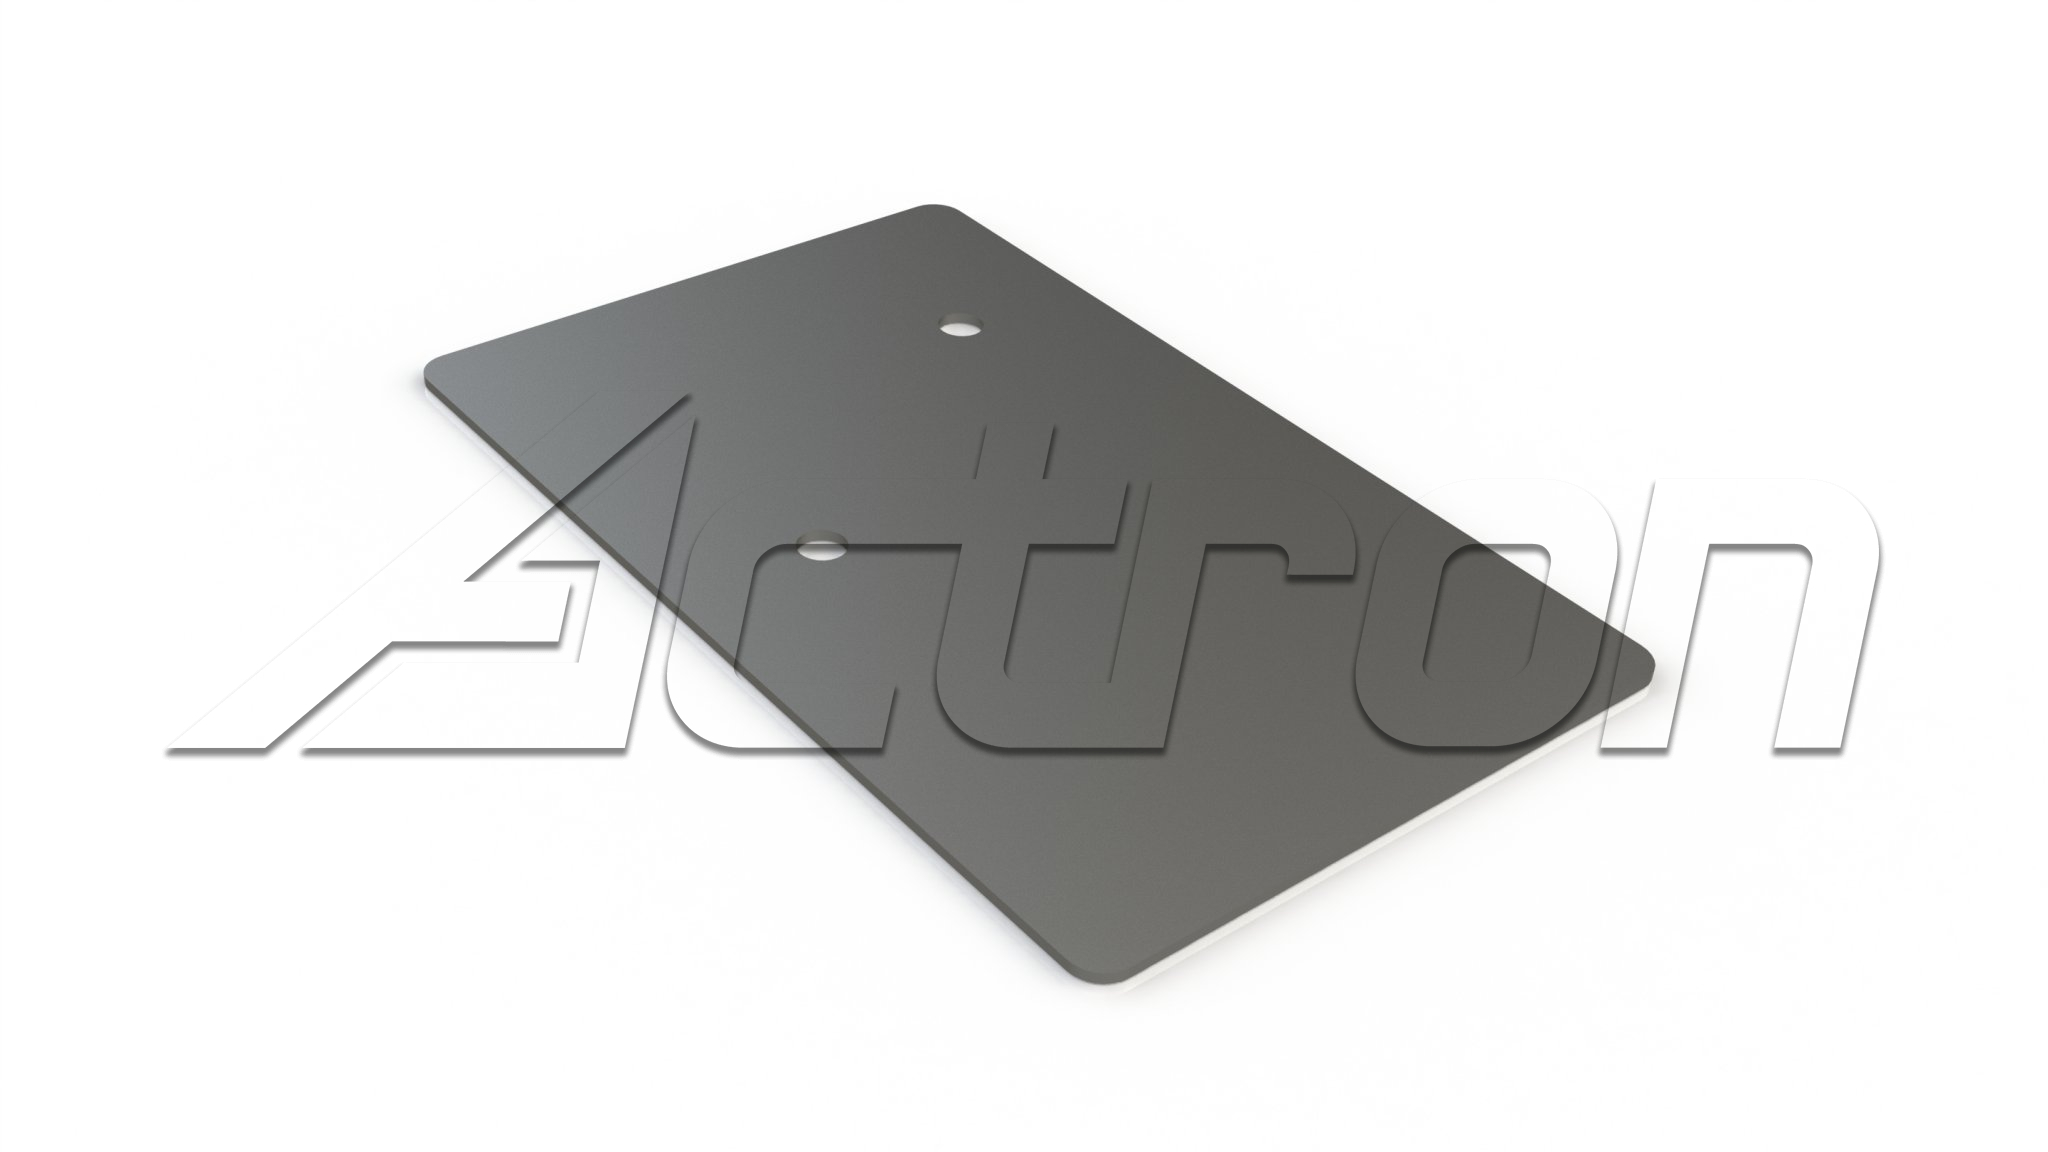 mounting-plate-8211-latch-5266-a43014.jpg